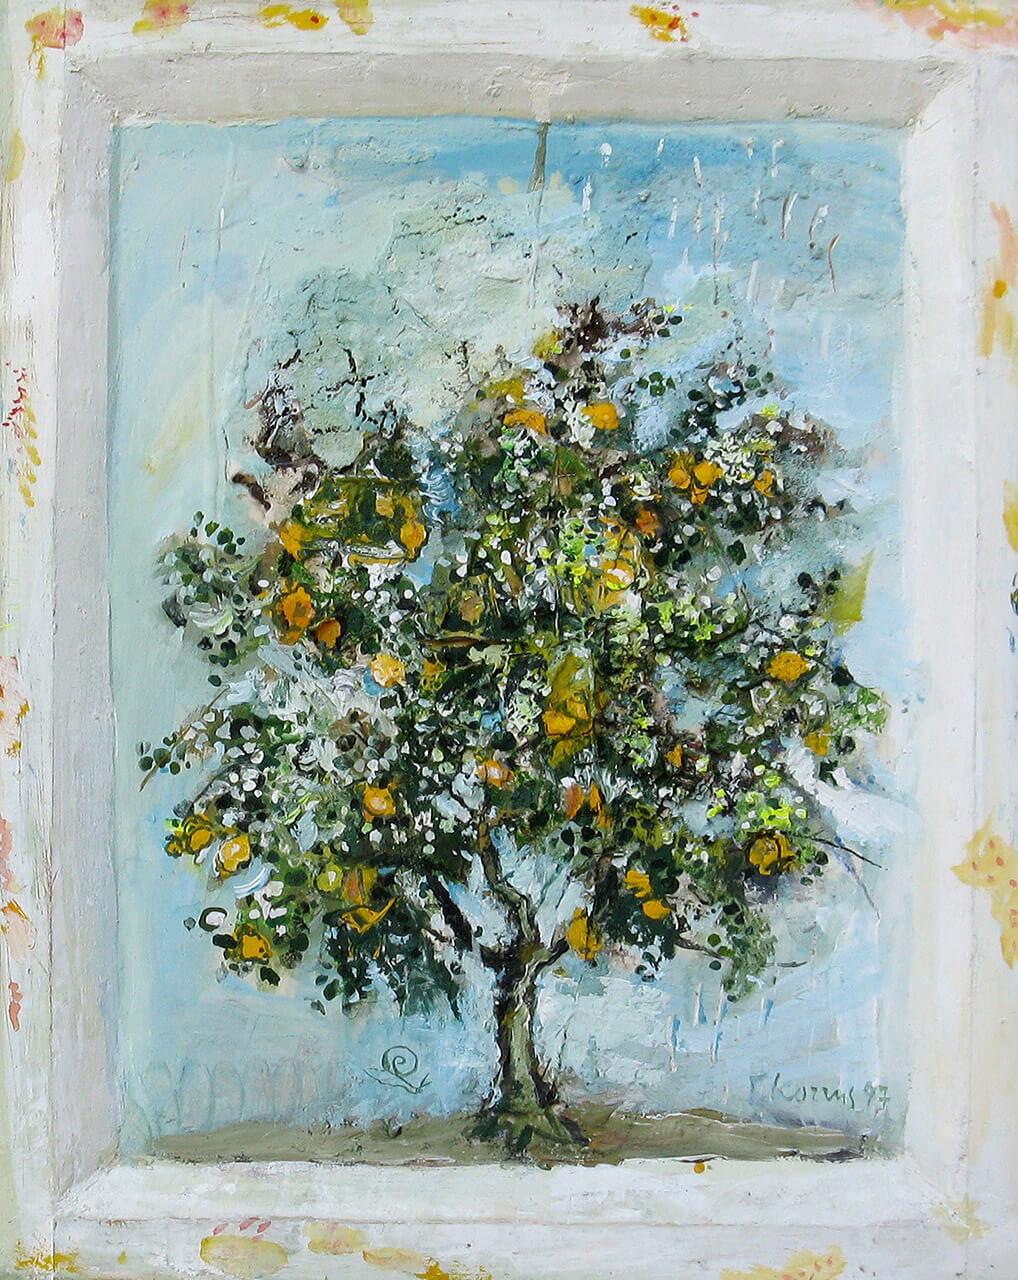 116a KOTTIS 'Quince tree' Kydonia 1997 mix.med.o.w.54X44 R1.5 (34a Dimitria)